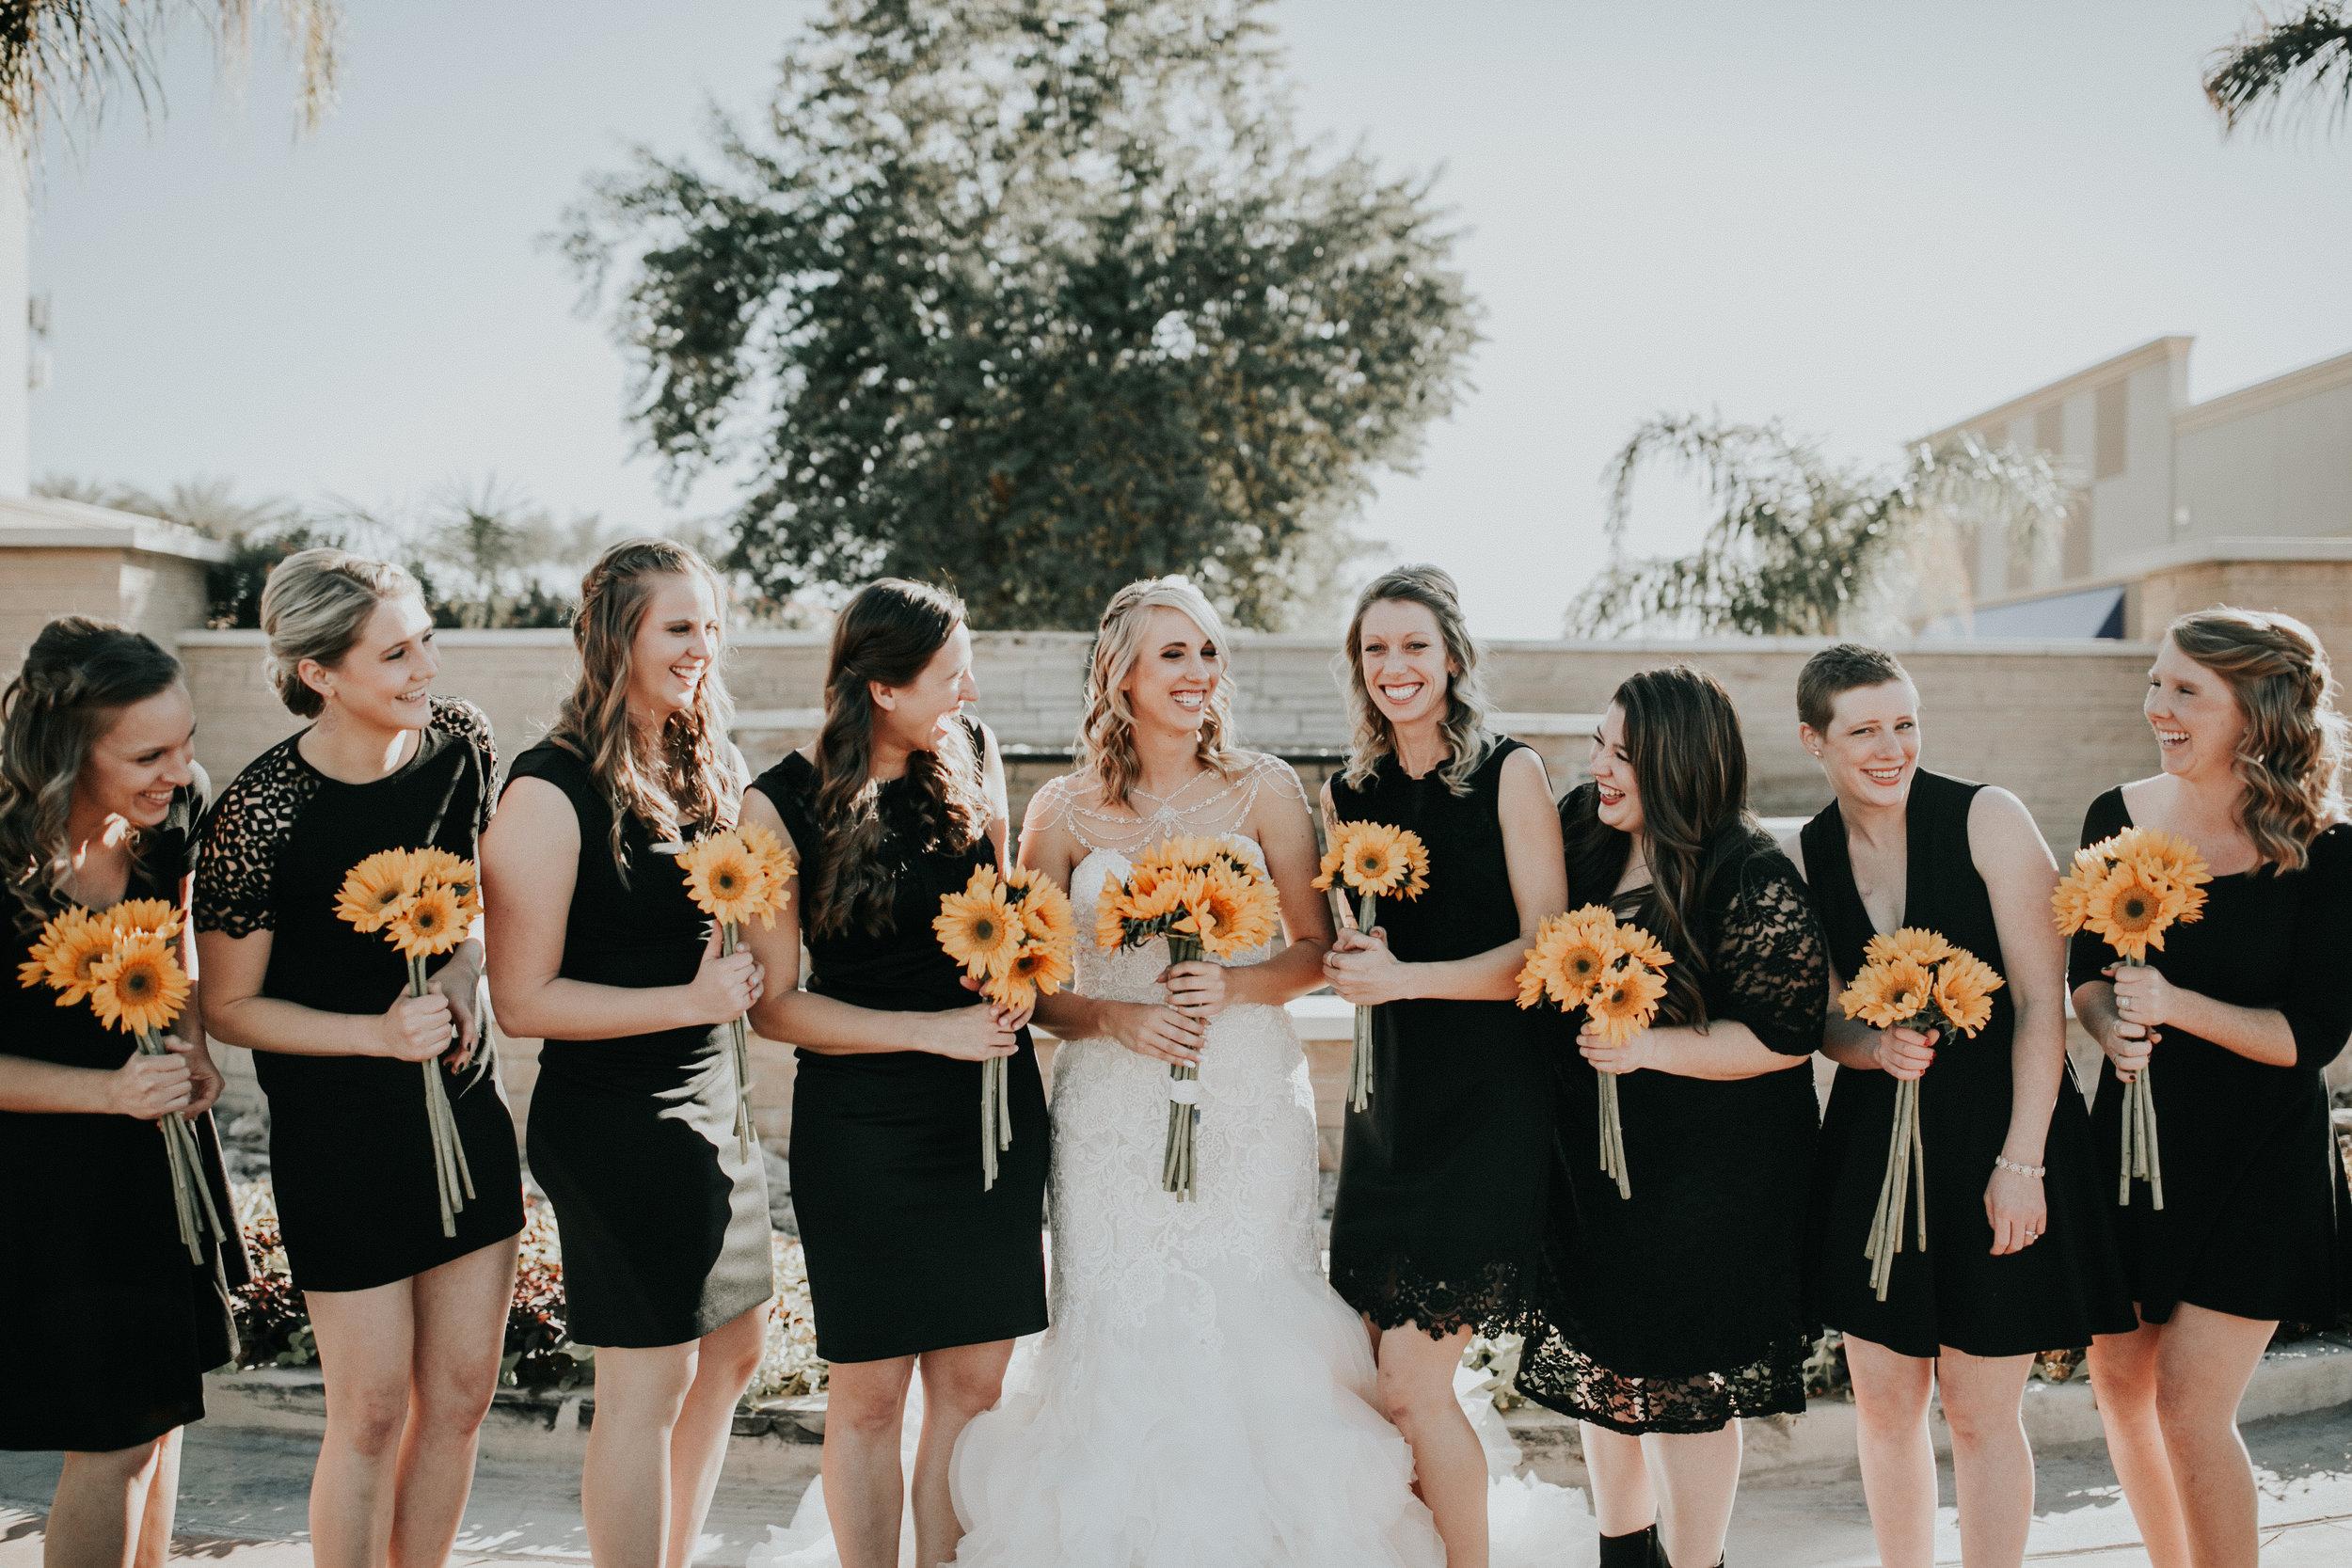 adventure-wedding-photographer-gracetphotography-21.jpg